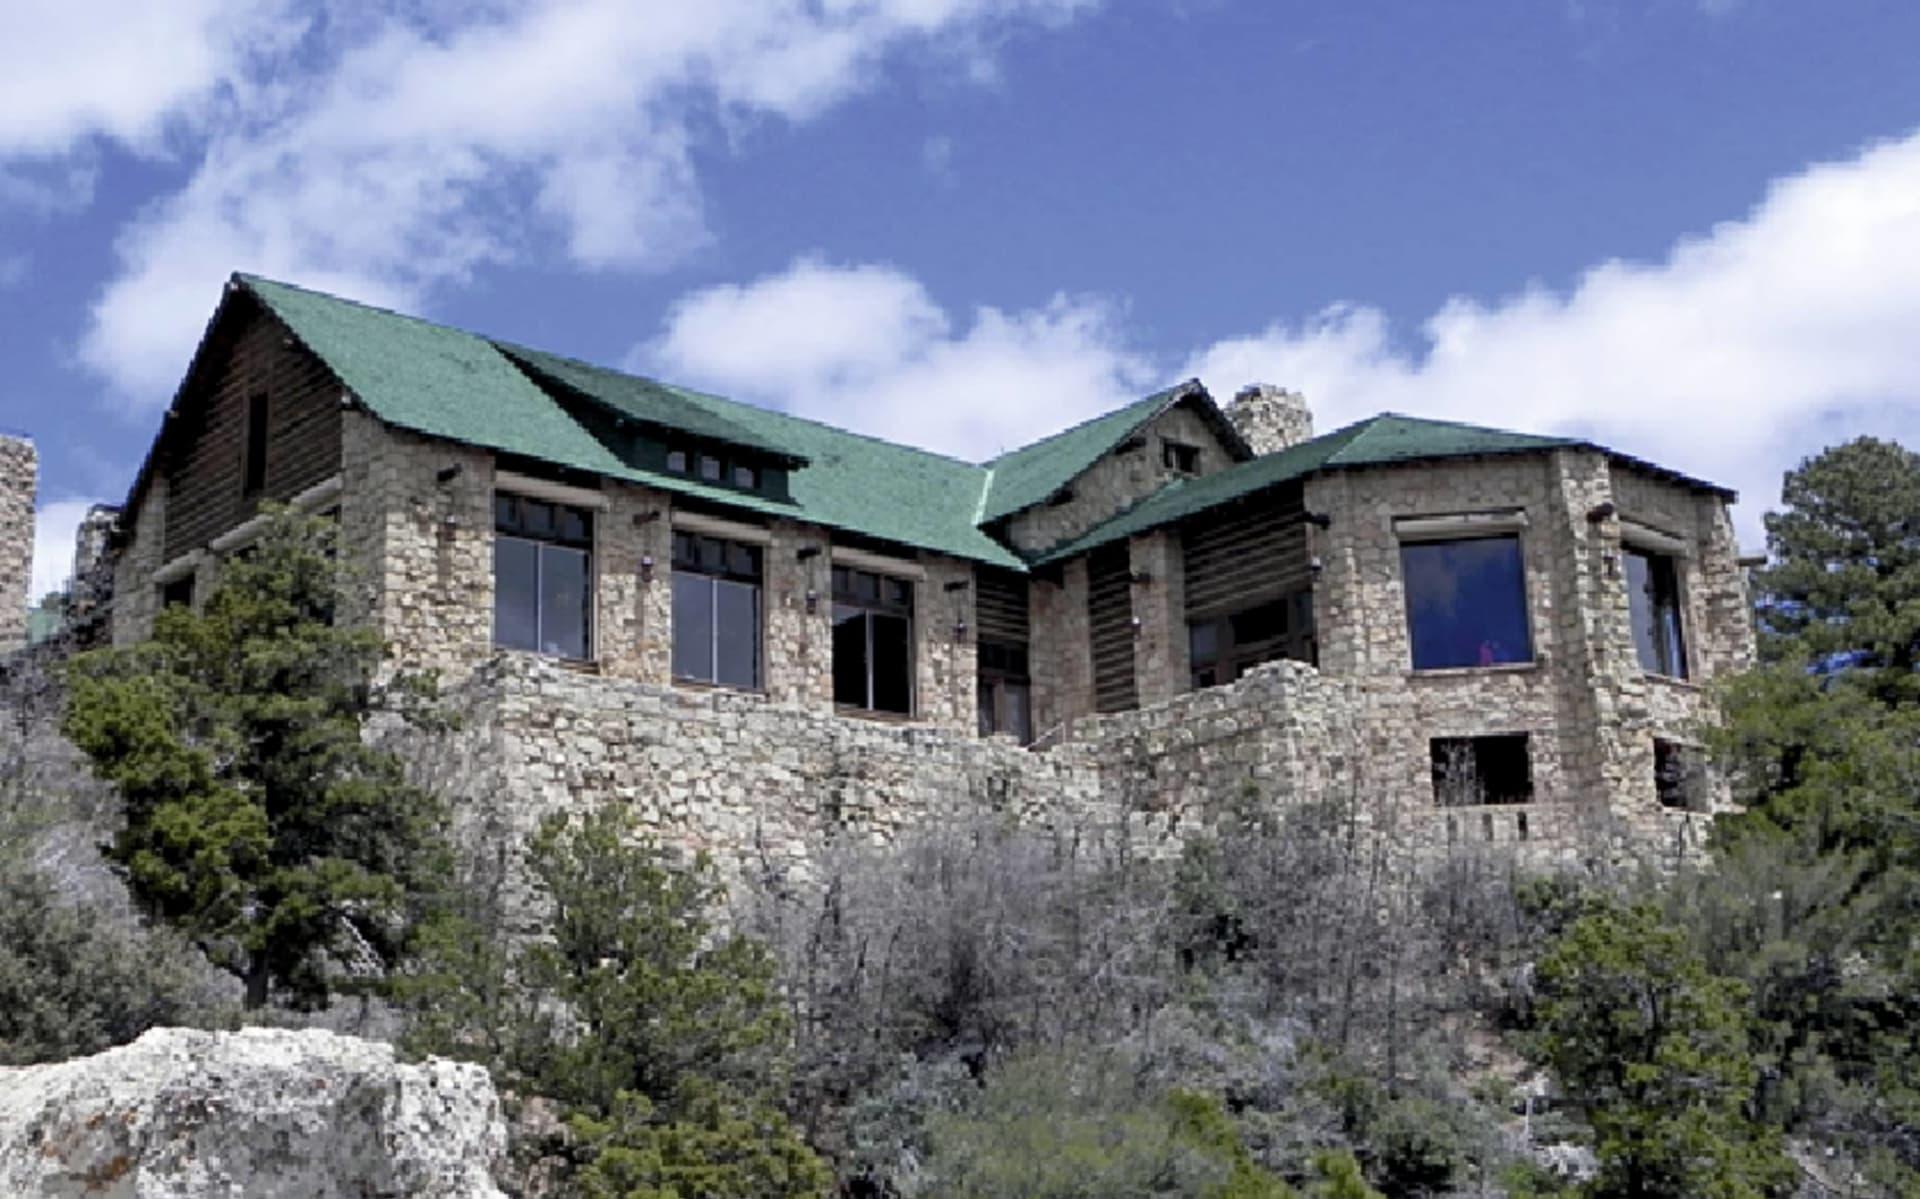 Grand Canyon Lodge North Rim in Grand Canyon Nationalpark: exterior grand canyon lodge north rim steinhaus